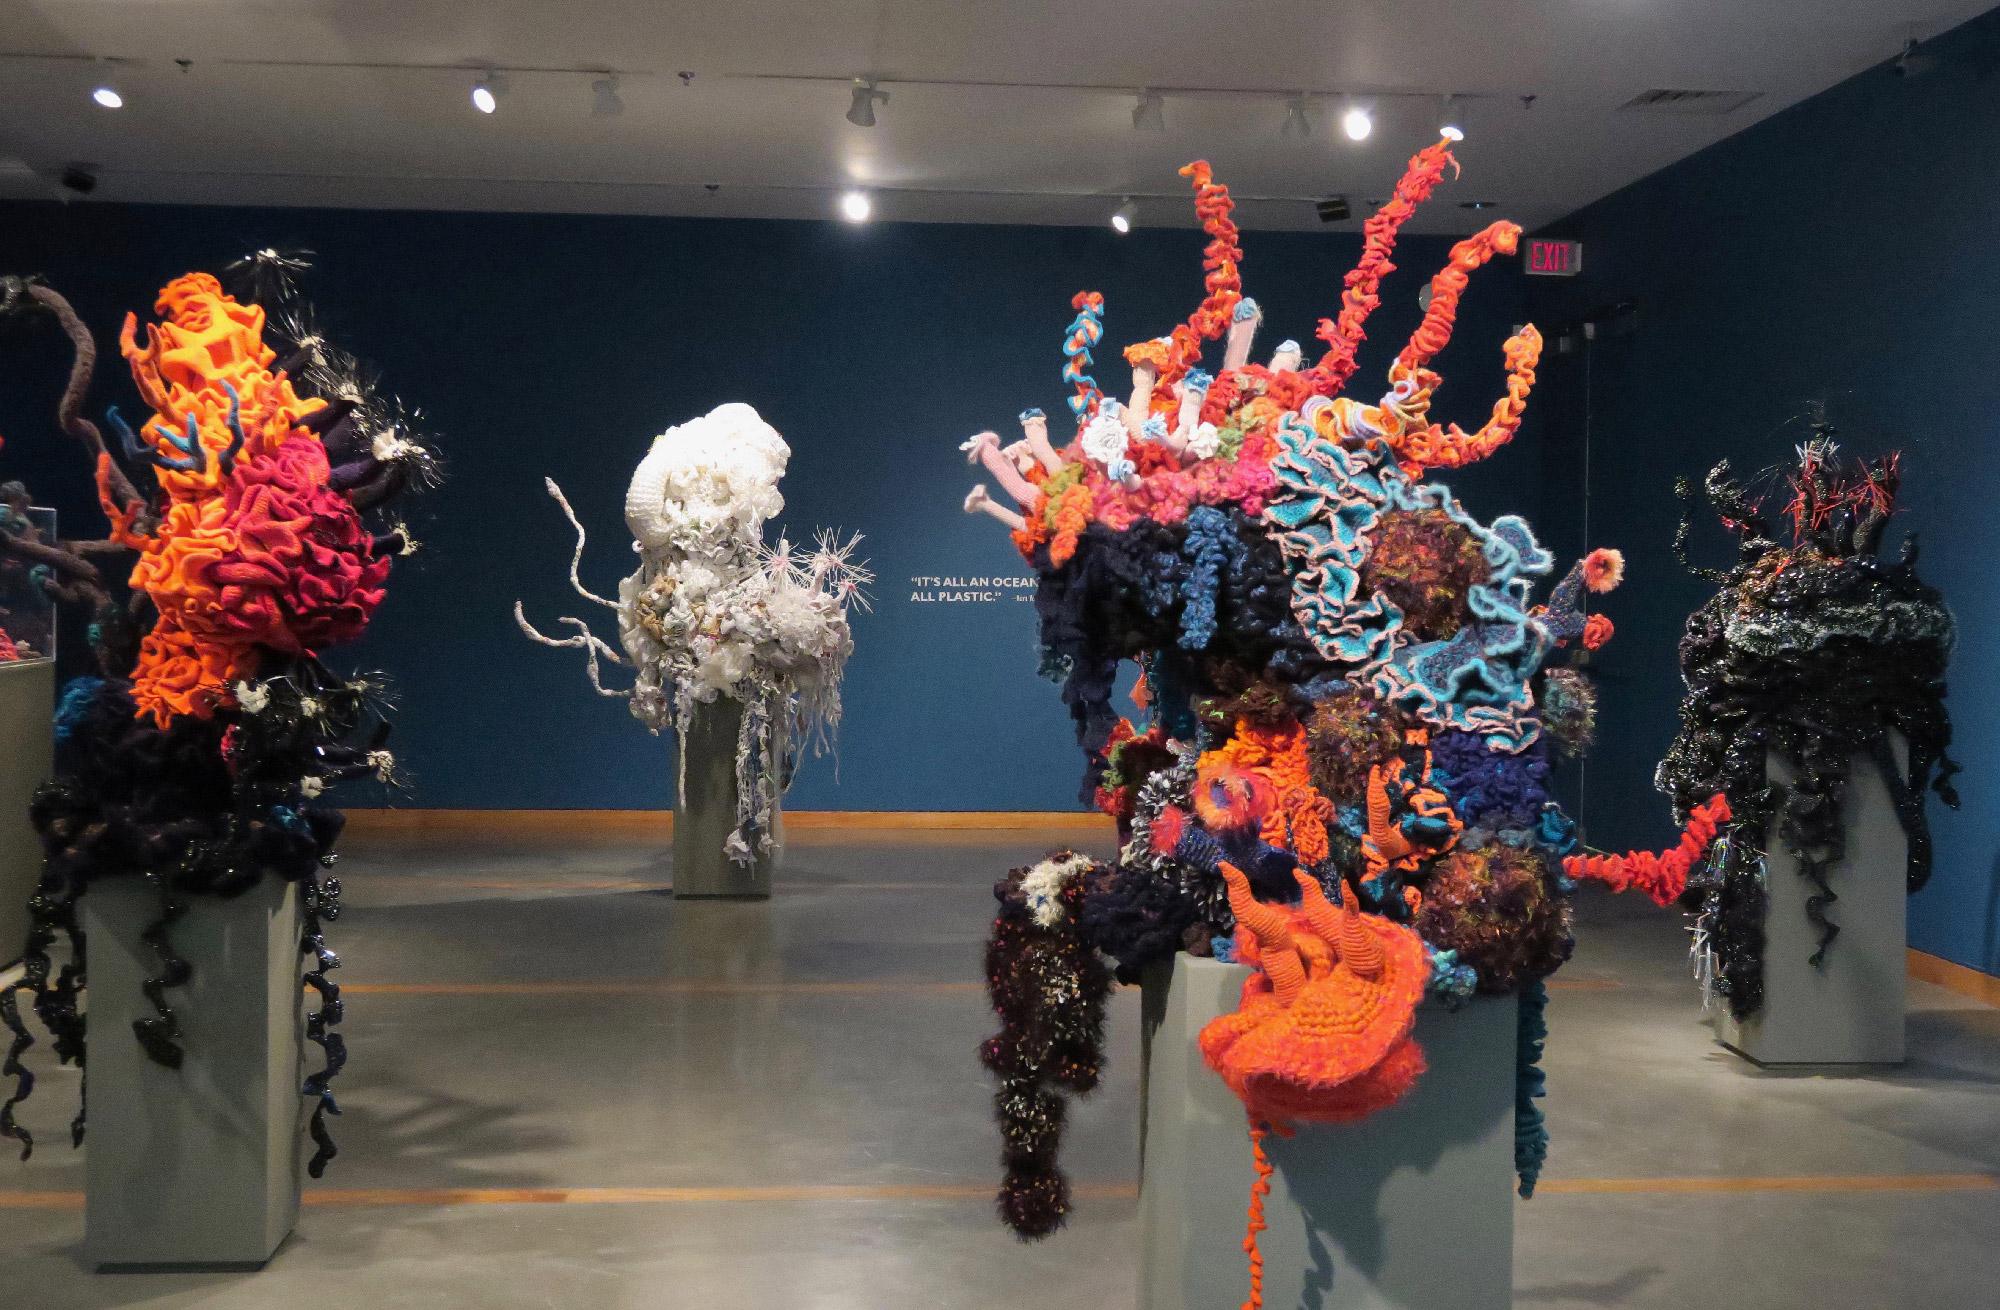 Reef sculptures in a gallery